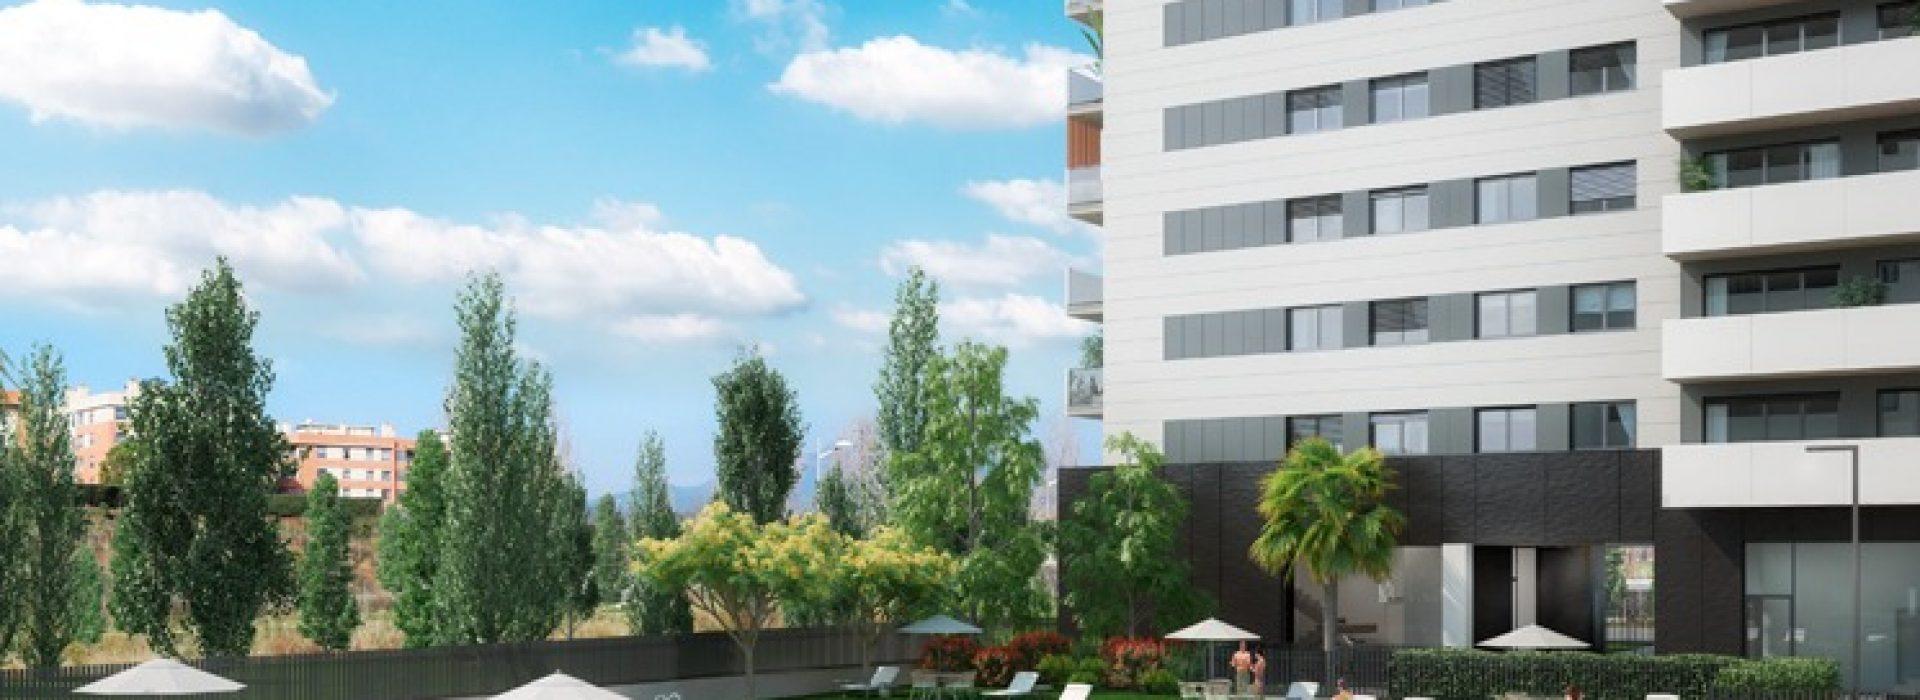 residencial-jardins-de-castellarnau04